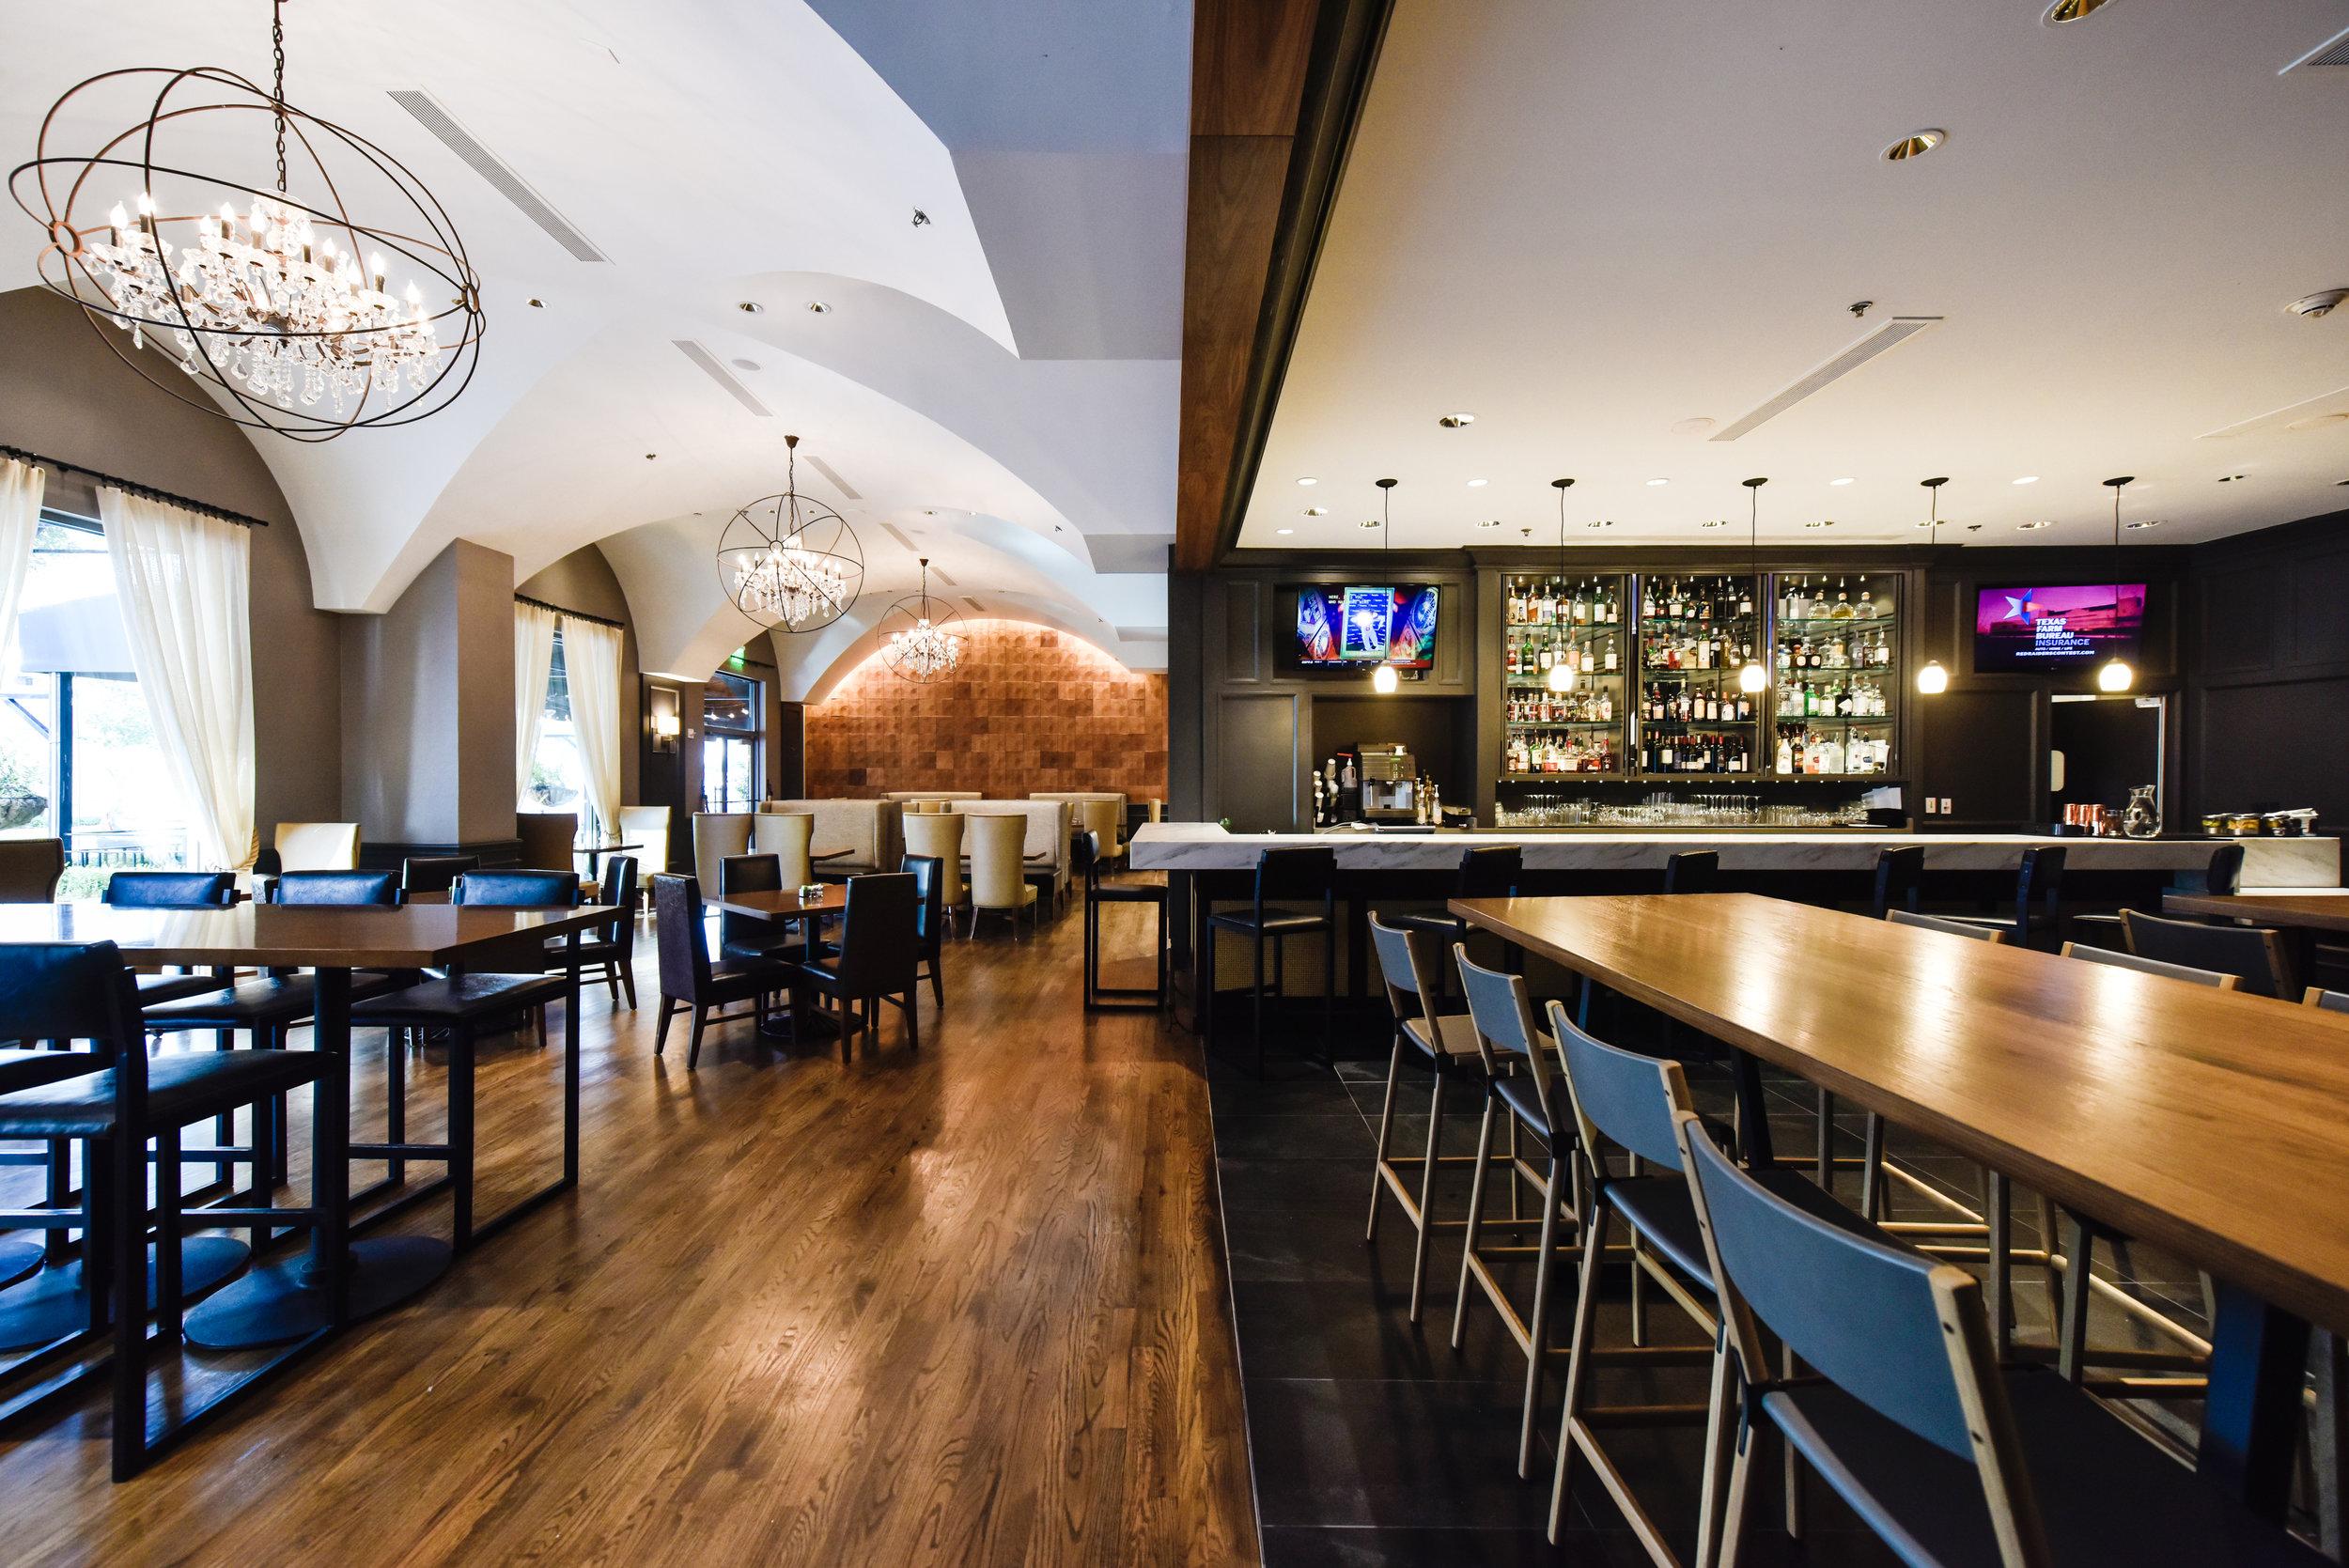 Hilton Hotel Dallas/Park Cities